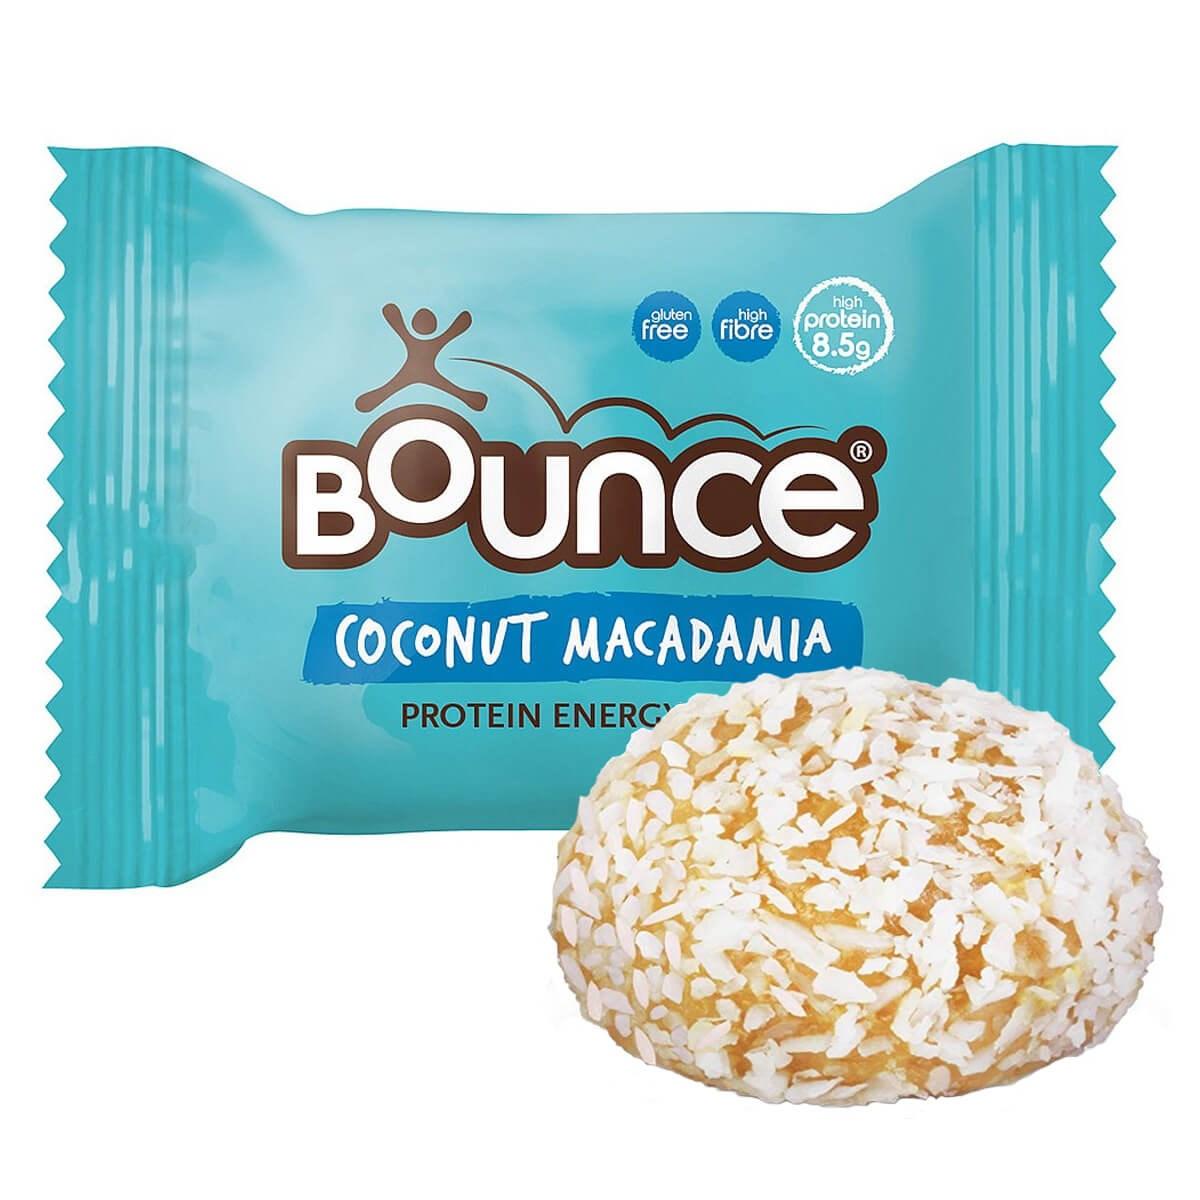 Bounce Coconut & Macadamia Protein Bliss